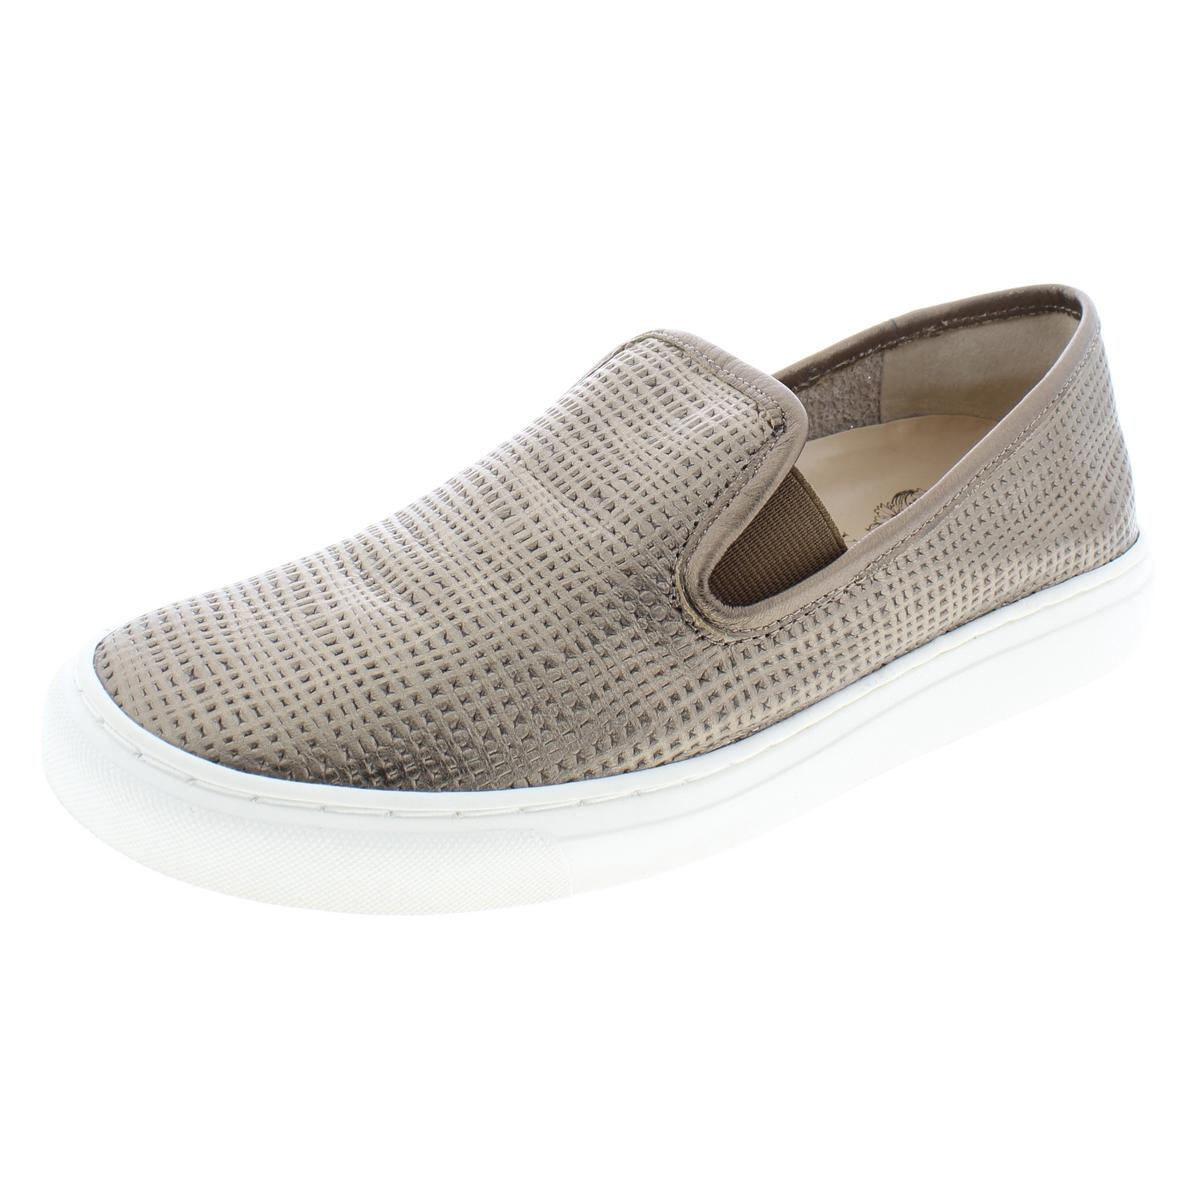 7da0a6d80330 Details about Vince Camuto Womens Becker Brown Loafers Shoes 9.5 Medium (B